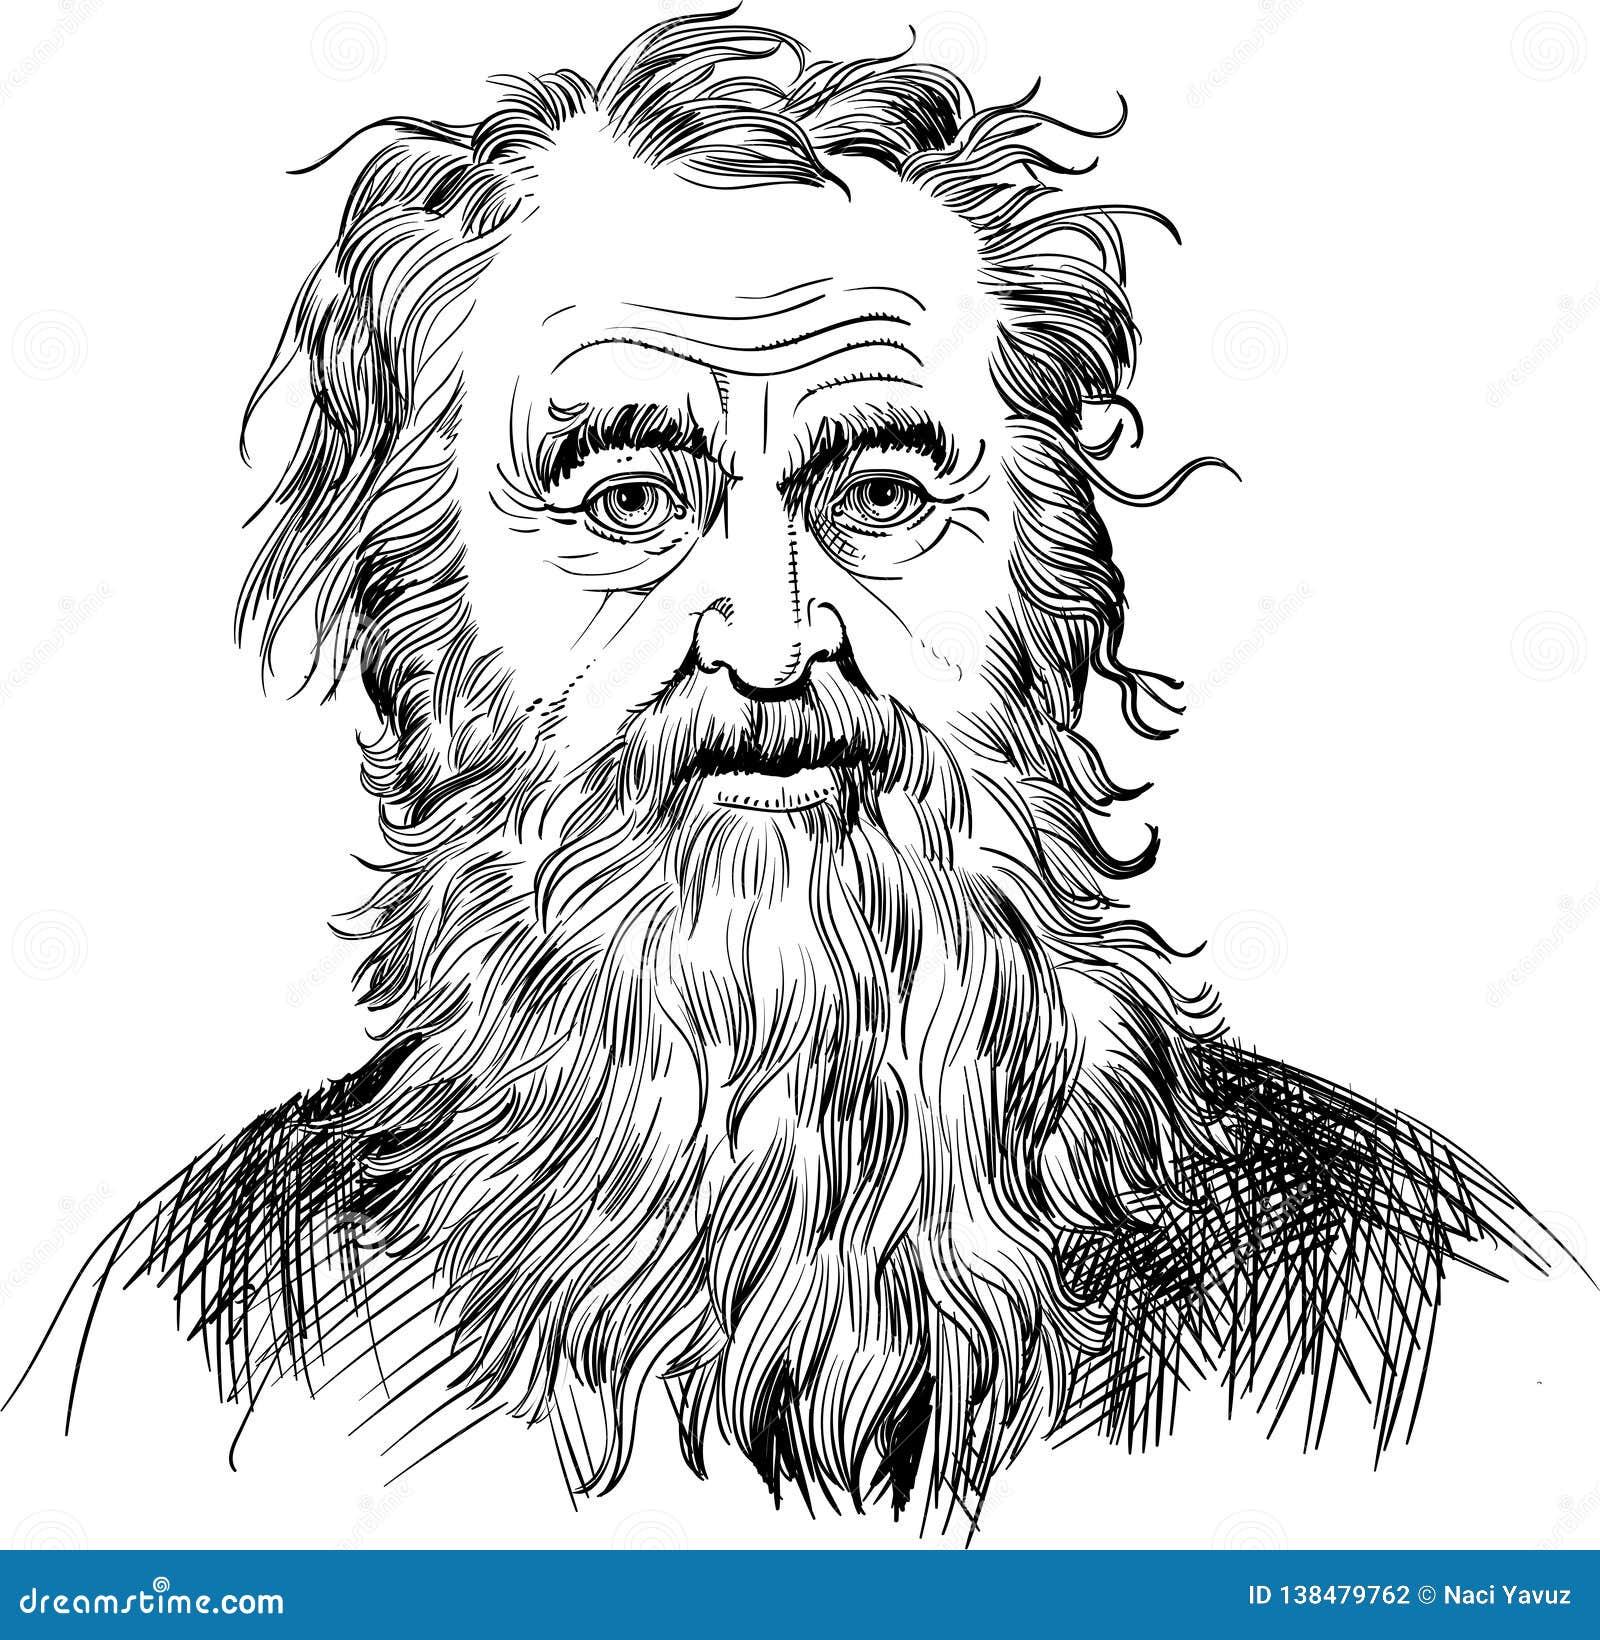 Diogenes Of Sinope Portrait In Line Art Illustration